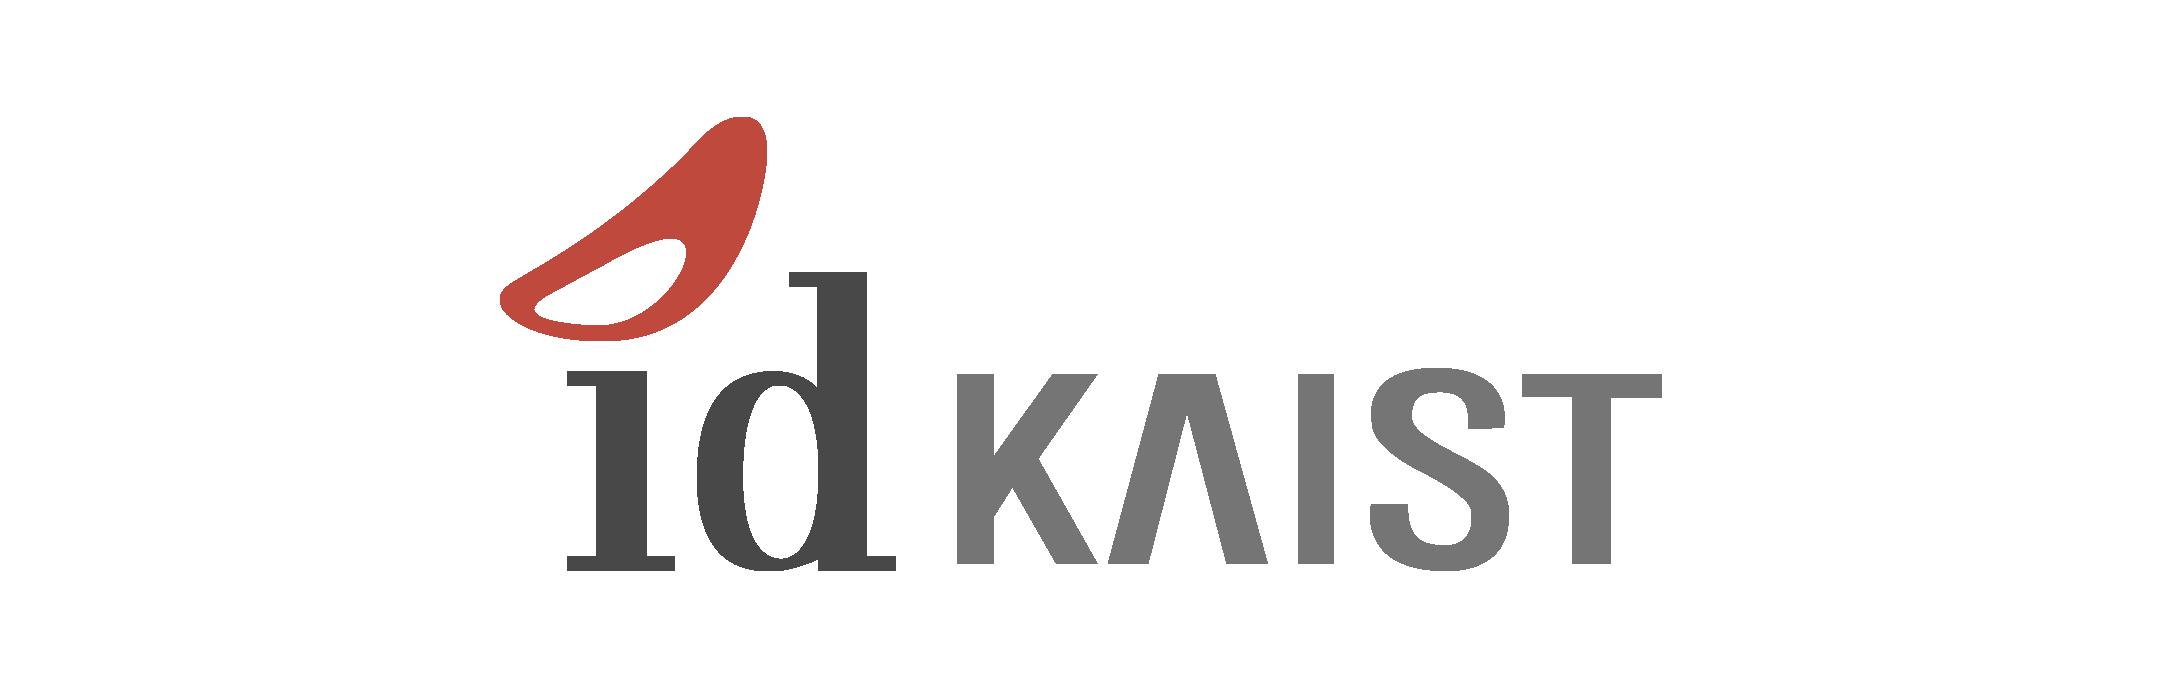 The original IDKAIST logo